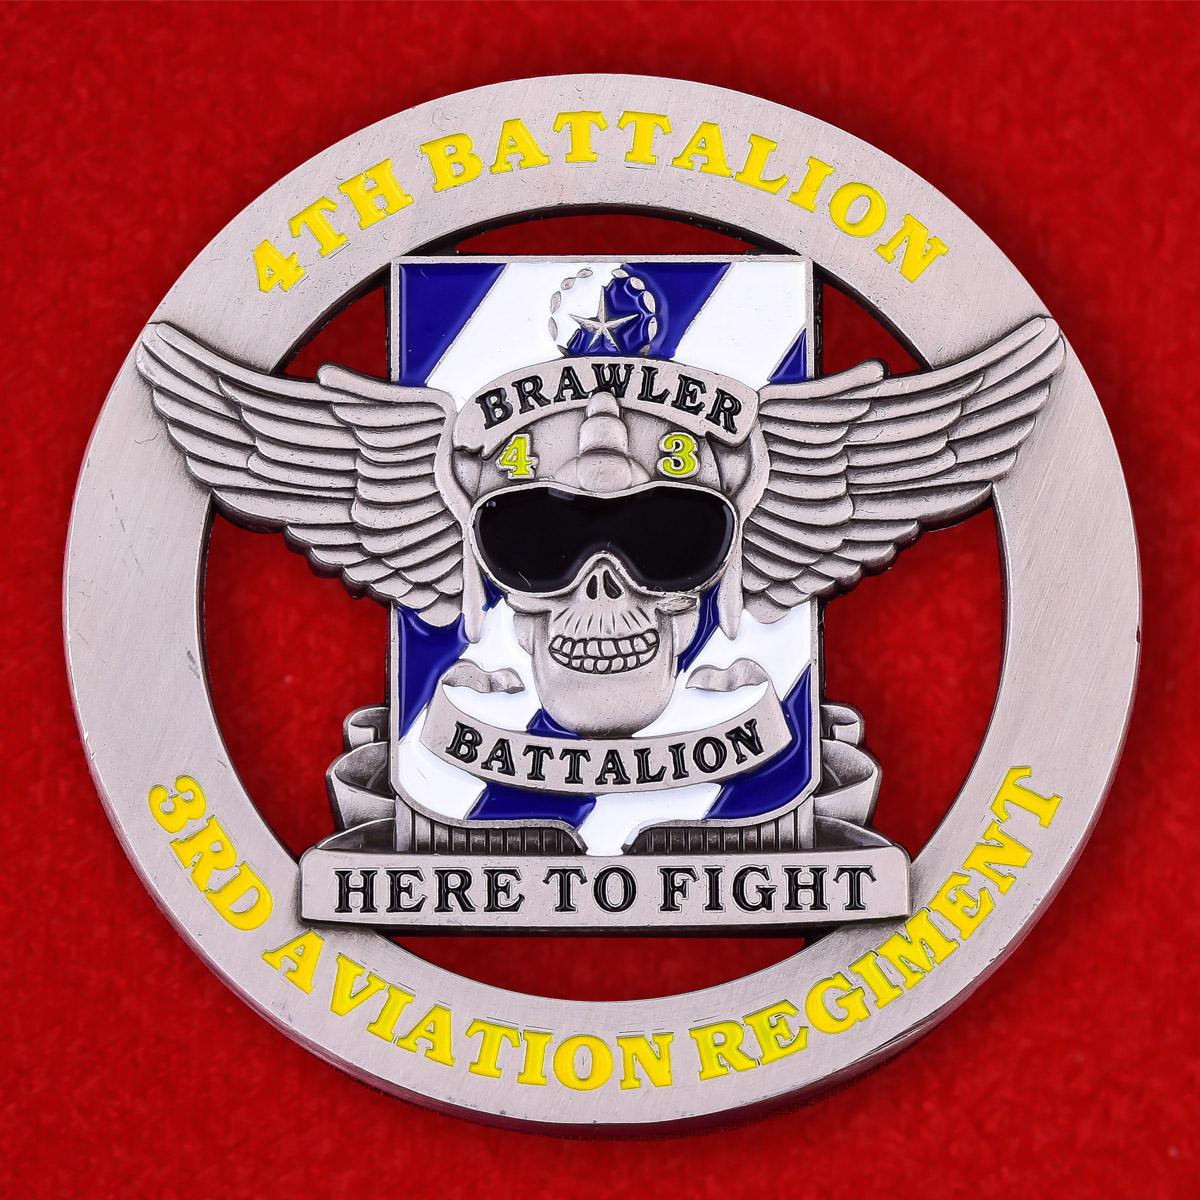 Челлендж коин 4-го батальона 3-го Авиационного полка Армии США